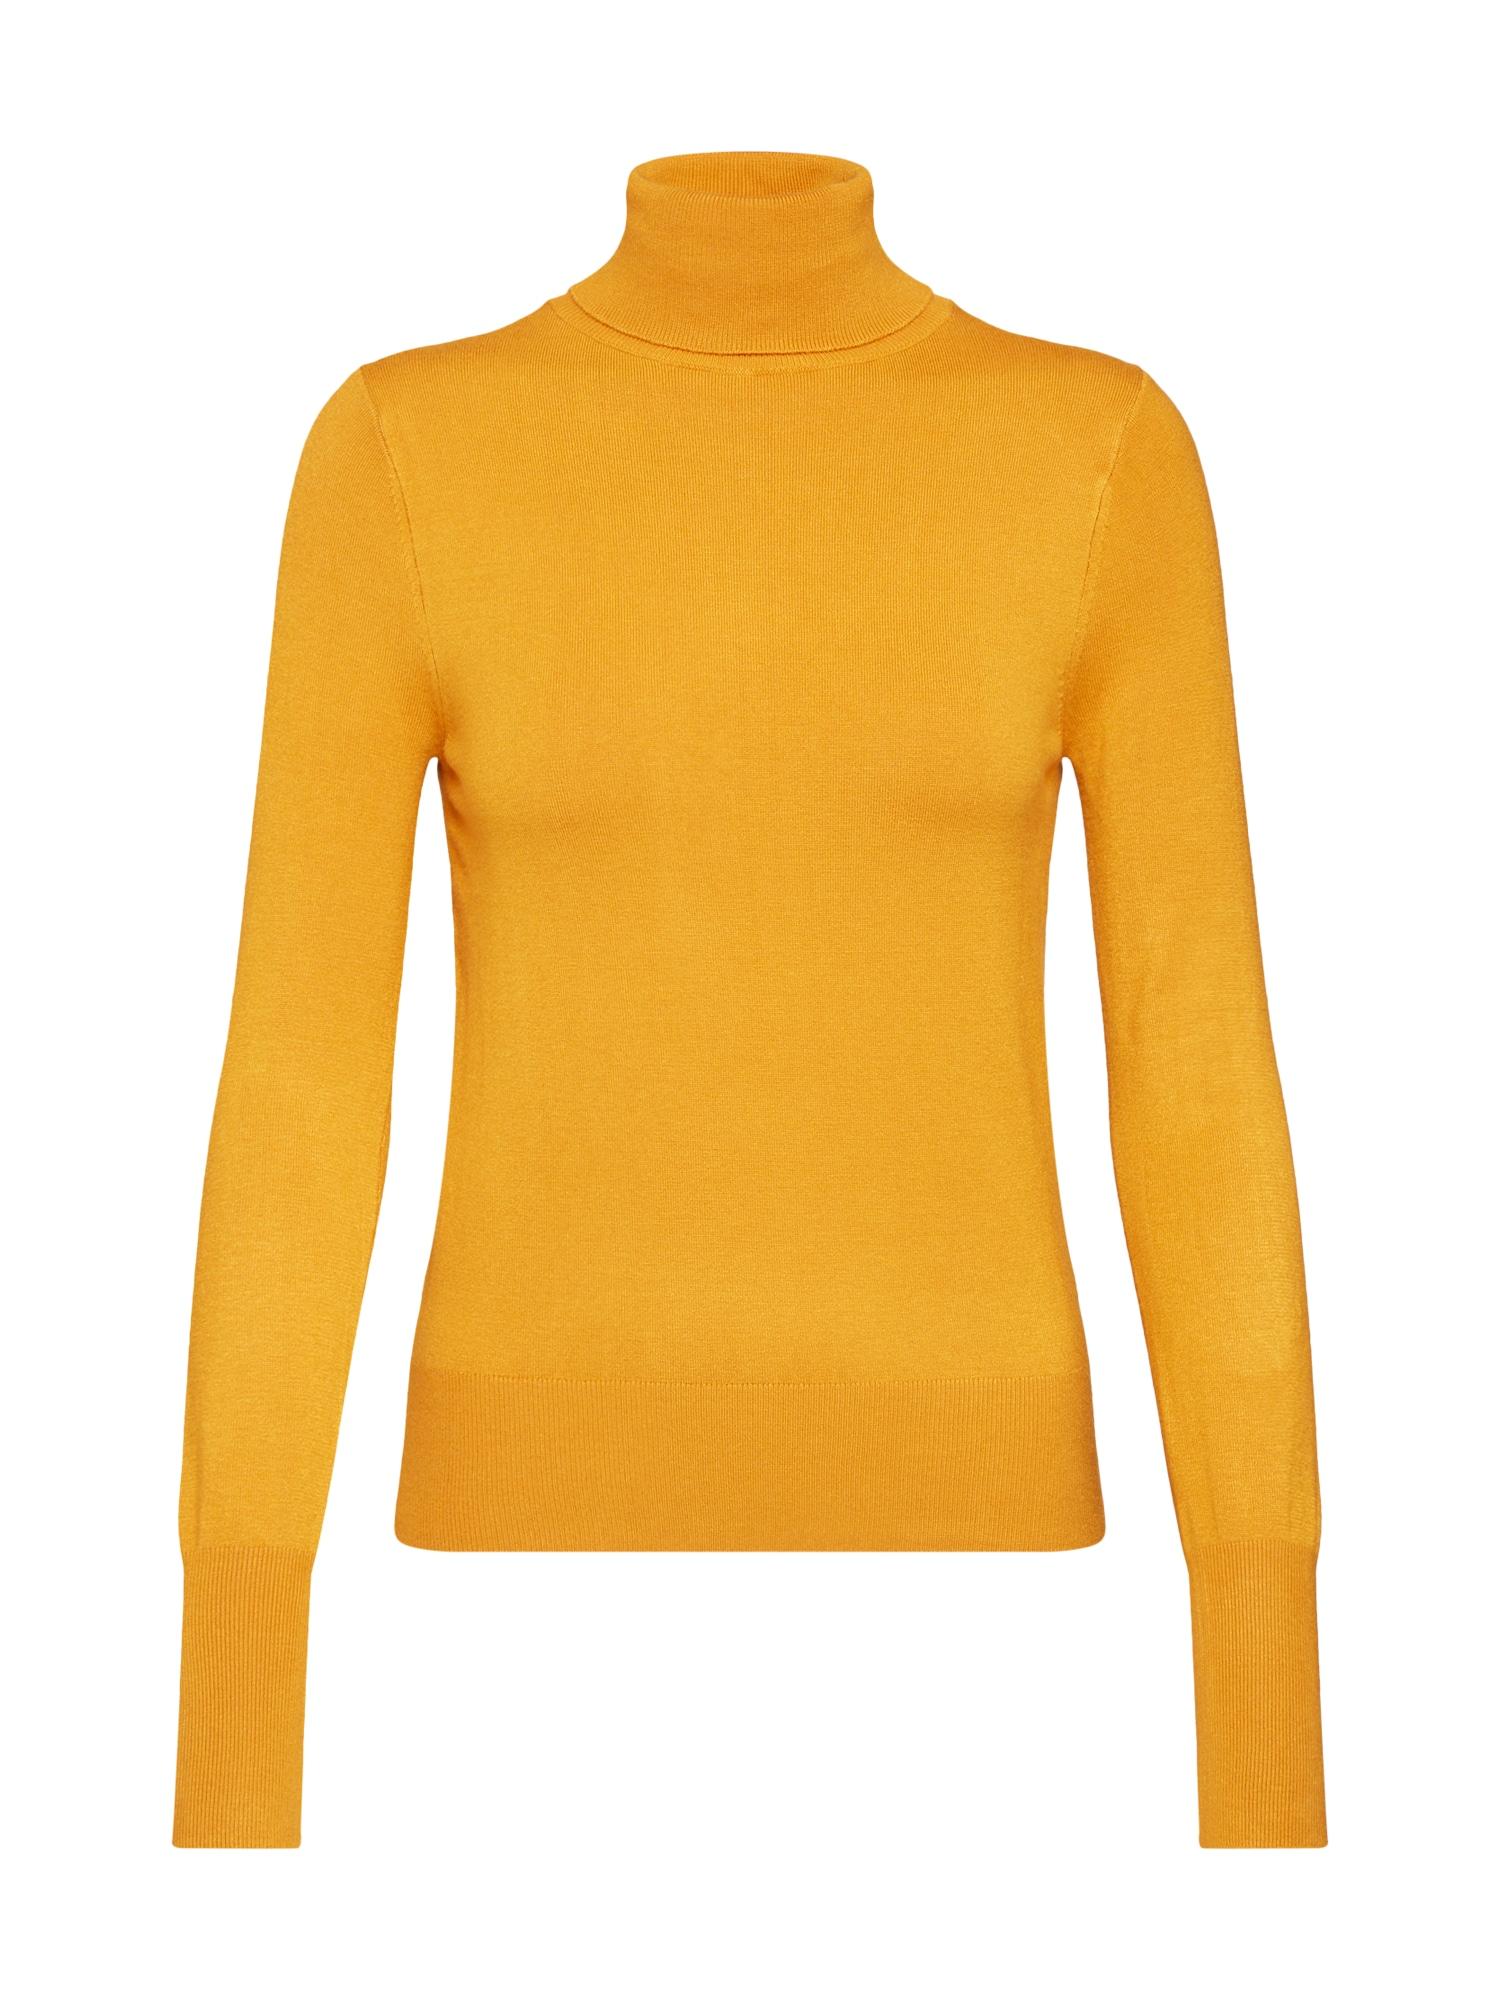 ONLY Megztinis 'VENICE' aukso geltonumo spalva